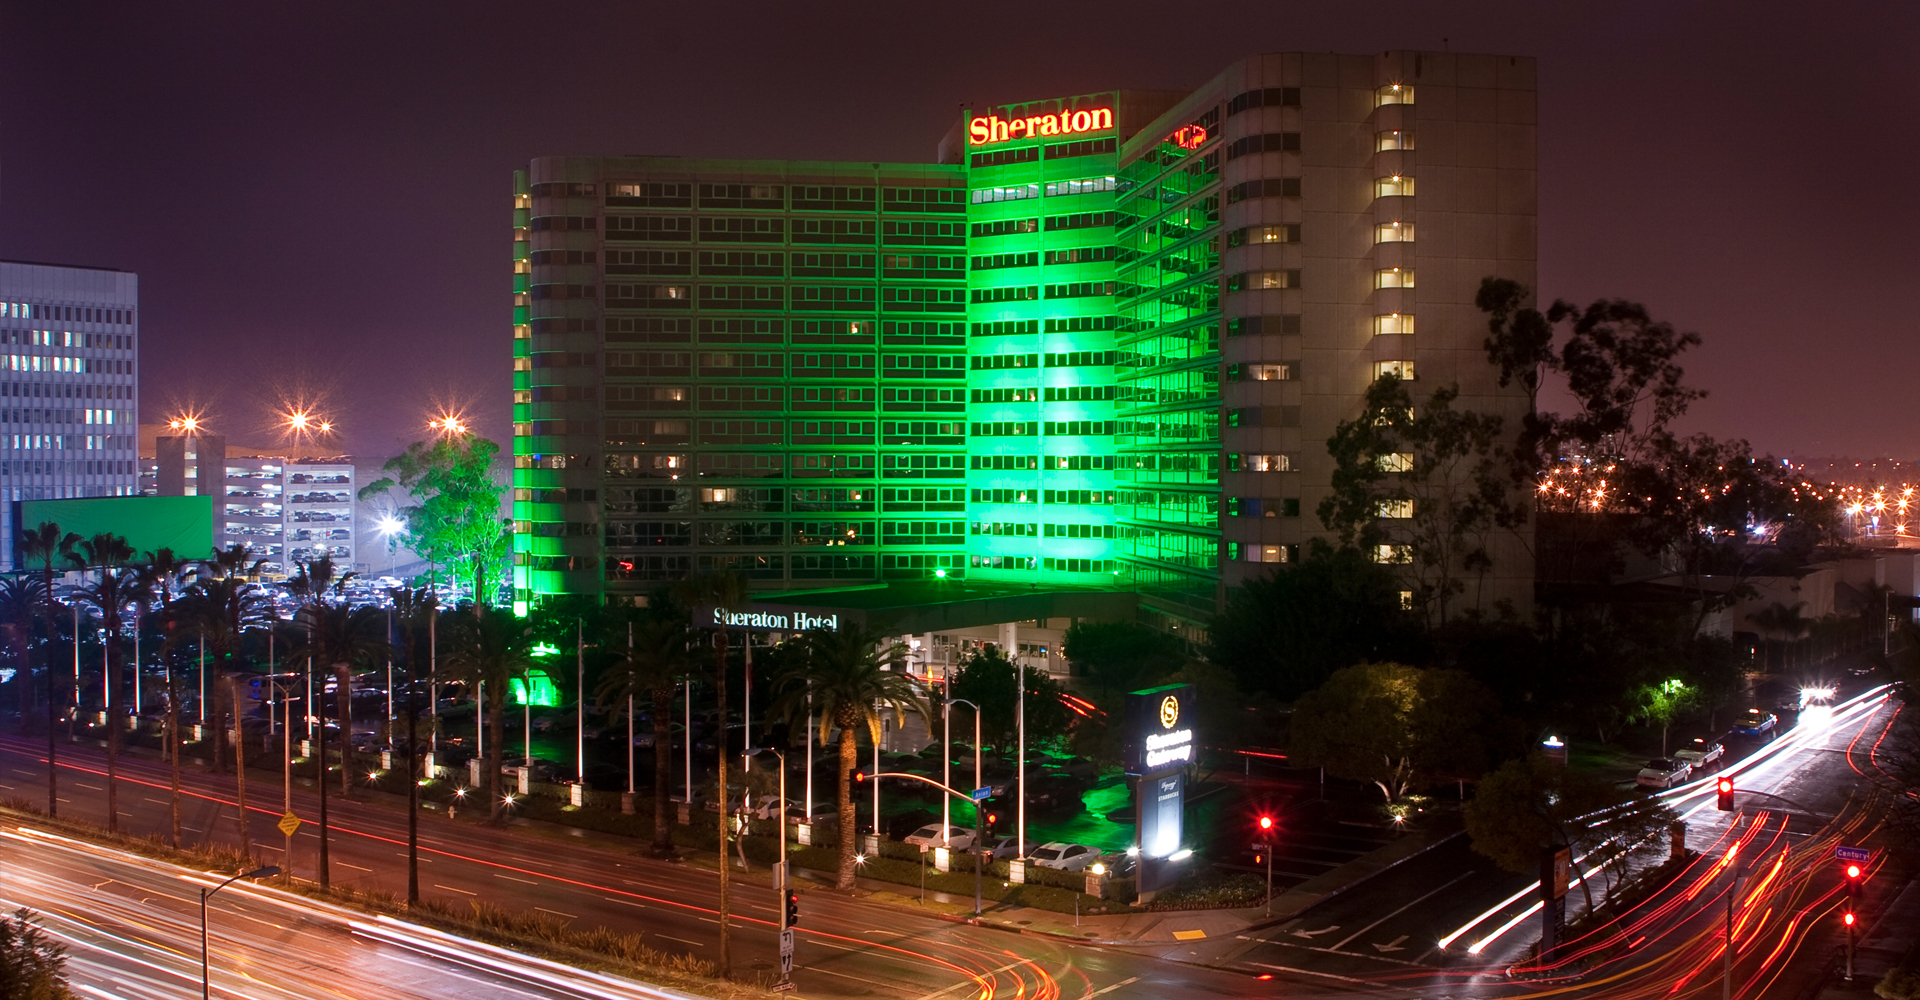 Sheraton Hotel.jpg